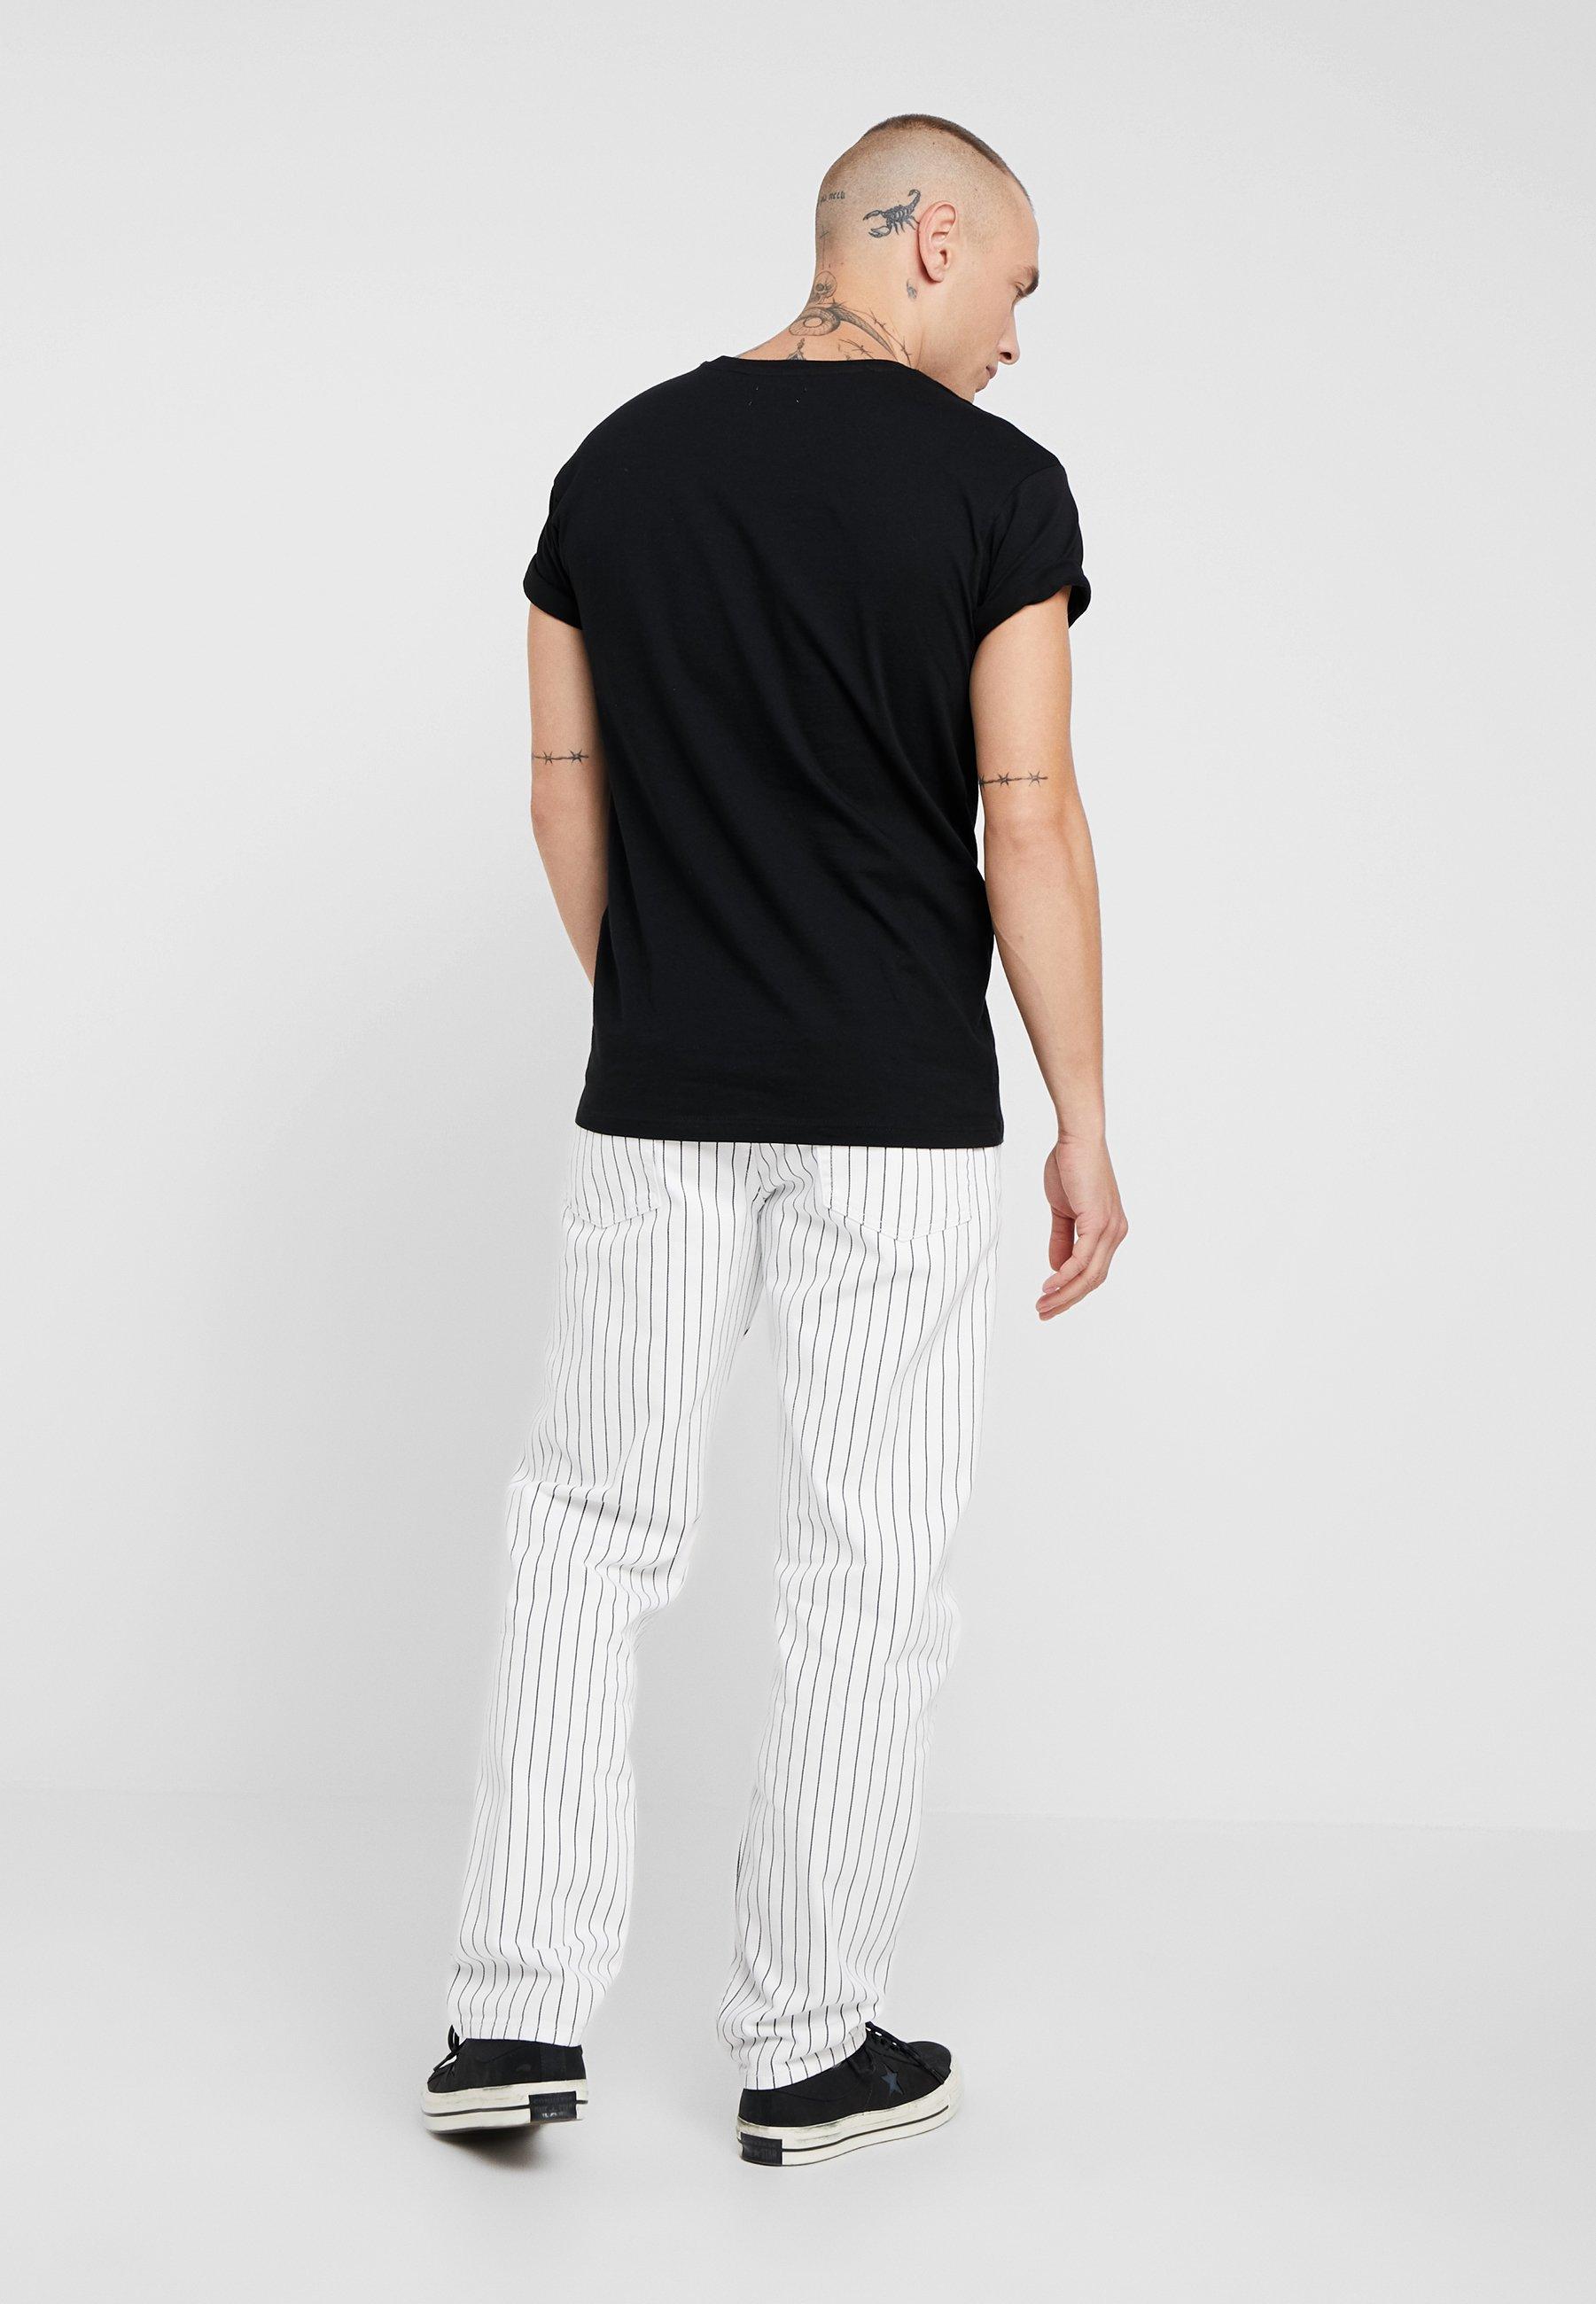 Black Basique white Topman 2 PackT shirt qSGUzMVp